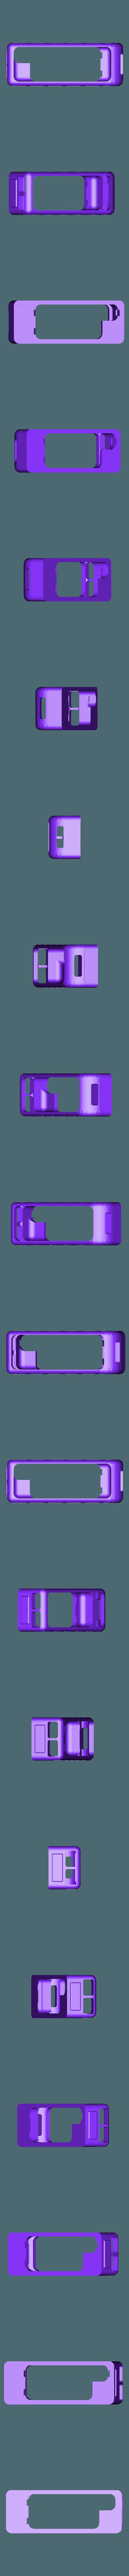 bus-haut-encoches.stl Download free STL file London Bus Doubledeck Routemaster desk organizer (Boite à crayon bus anglais) • 3D printing object, Martymcflay